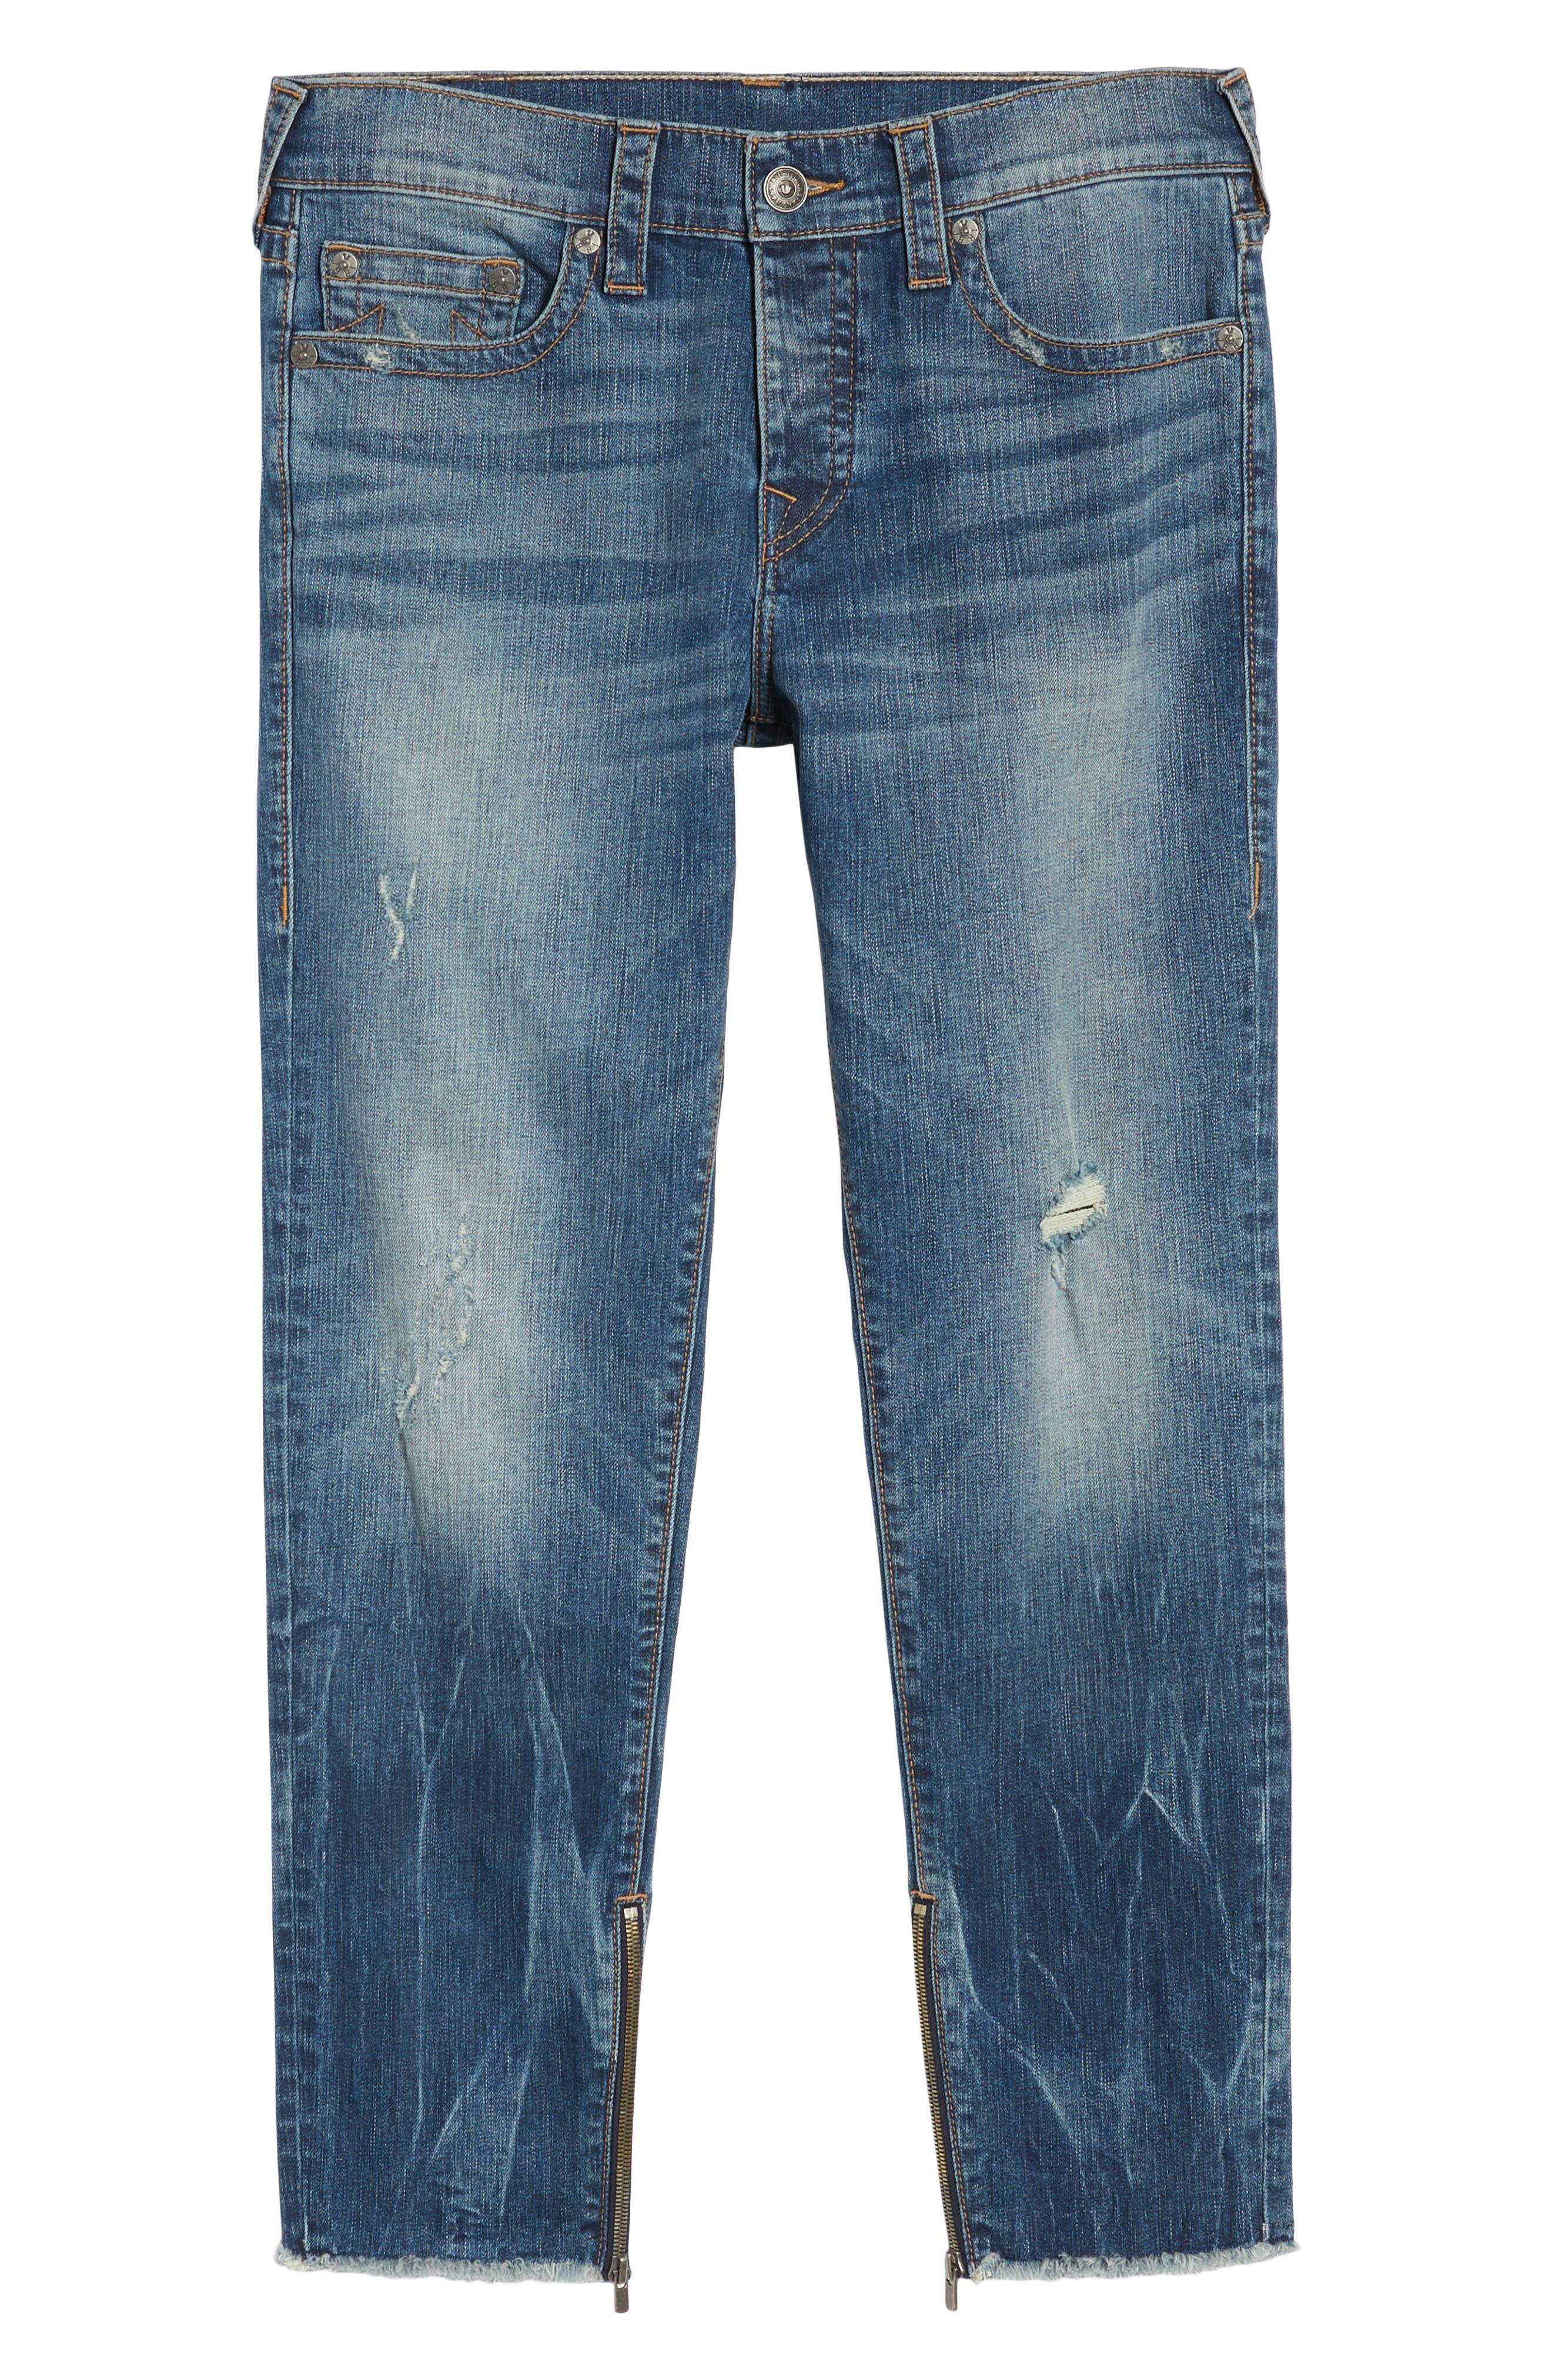 Finn Frayed Skinny Fit Jeans,                             Alternate thumbnail 6, color,                             402